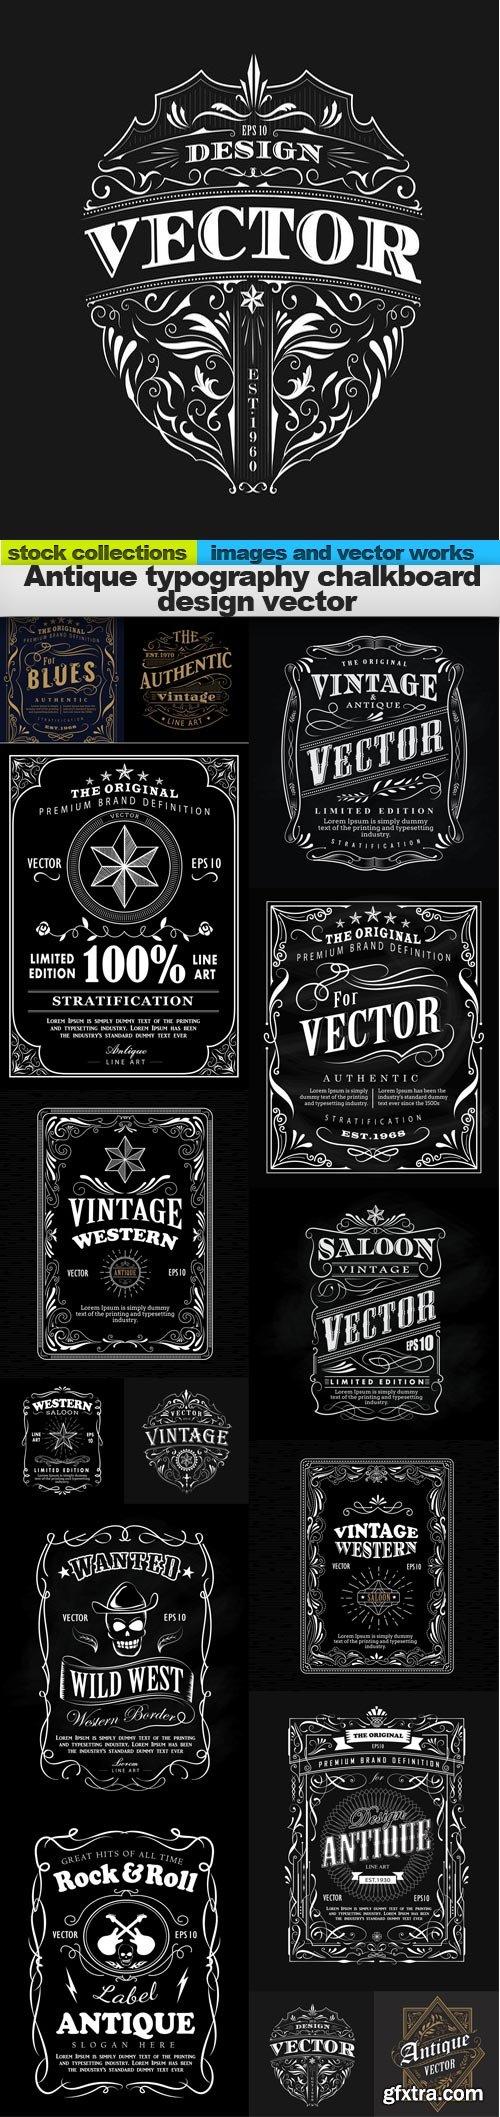 Antique typography chalkboard design vector, 15 x EPS